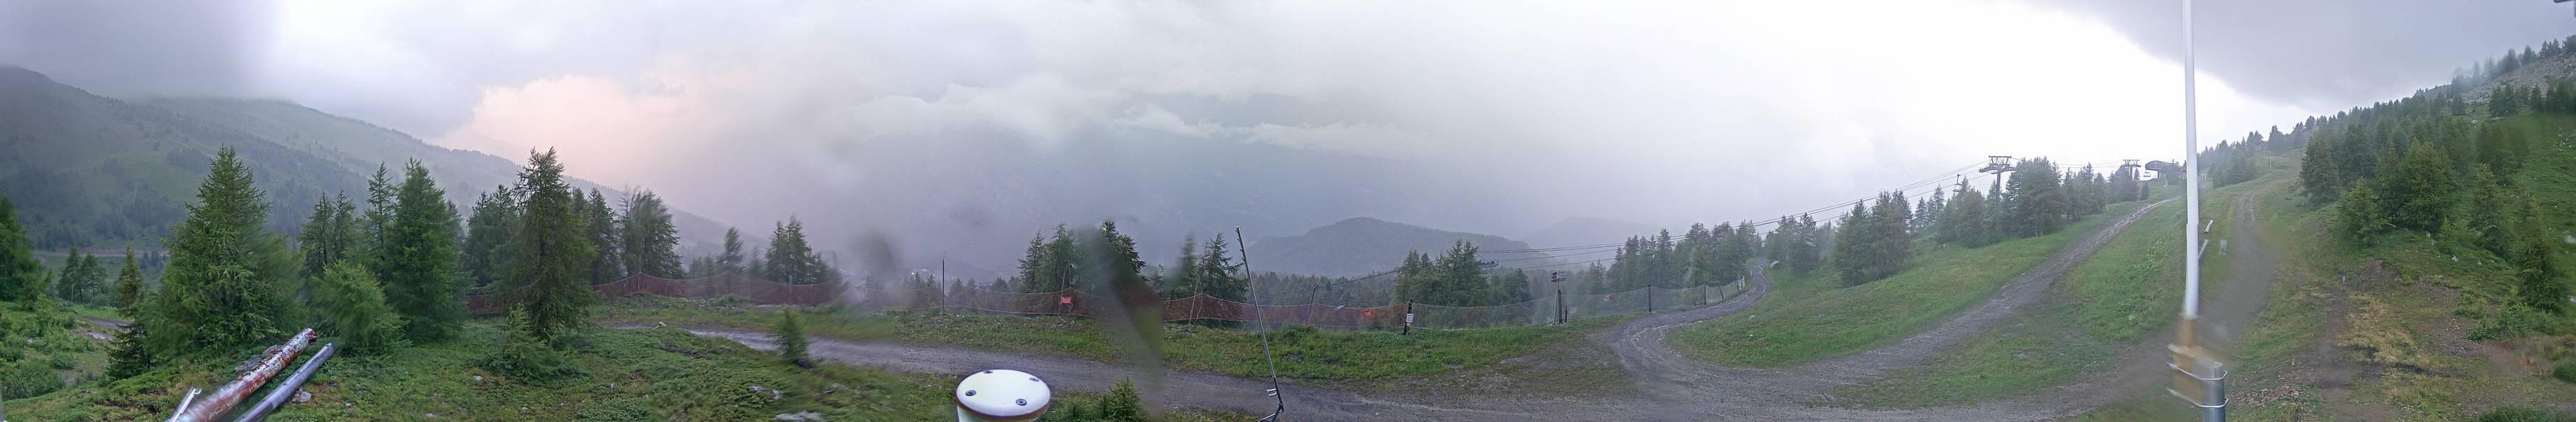 Vinouve 2130 m